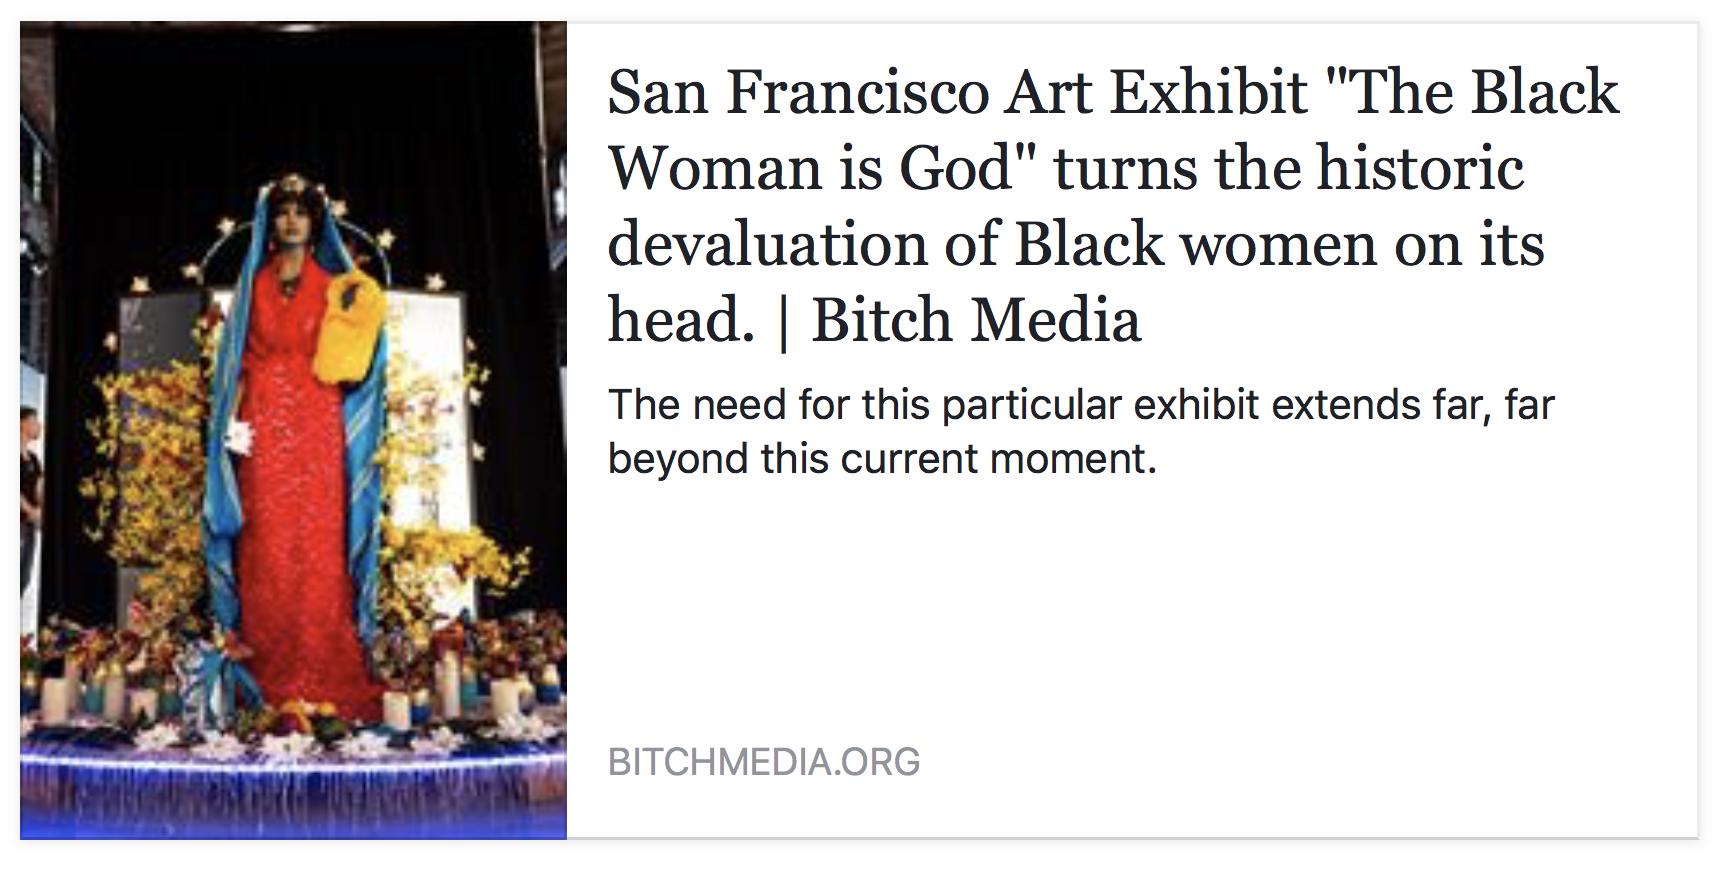 "Bapat, Sheila. ""San Francisco Art Exhibit ""The Black Woman Is God"" Turns the Historic Devaluation of Black Women on Its Head. | Bitch Media."" Bitch Media. N.p., 21 July 2016. Web. 22 July 2016."